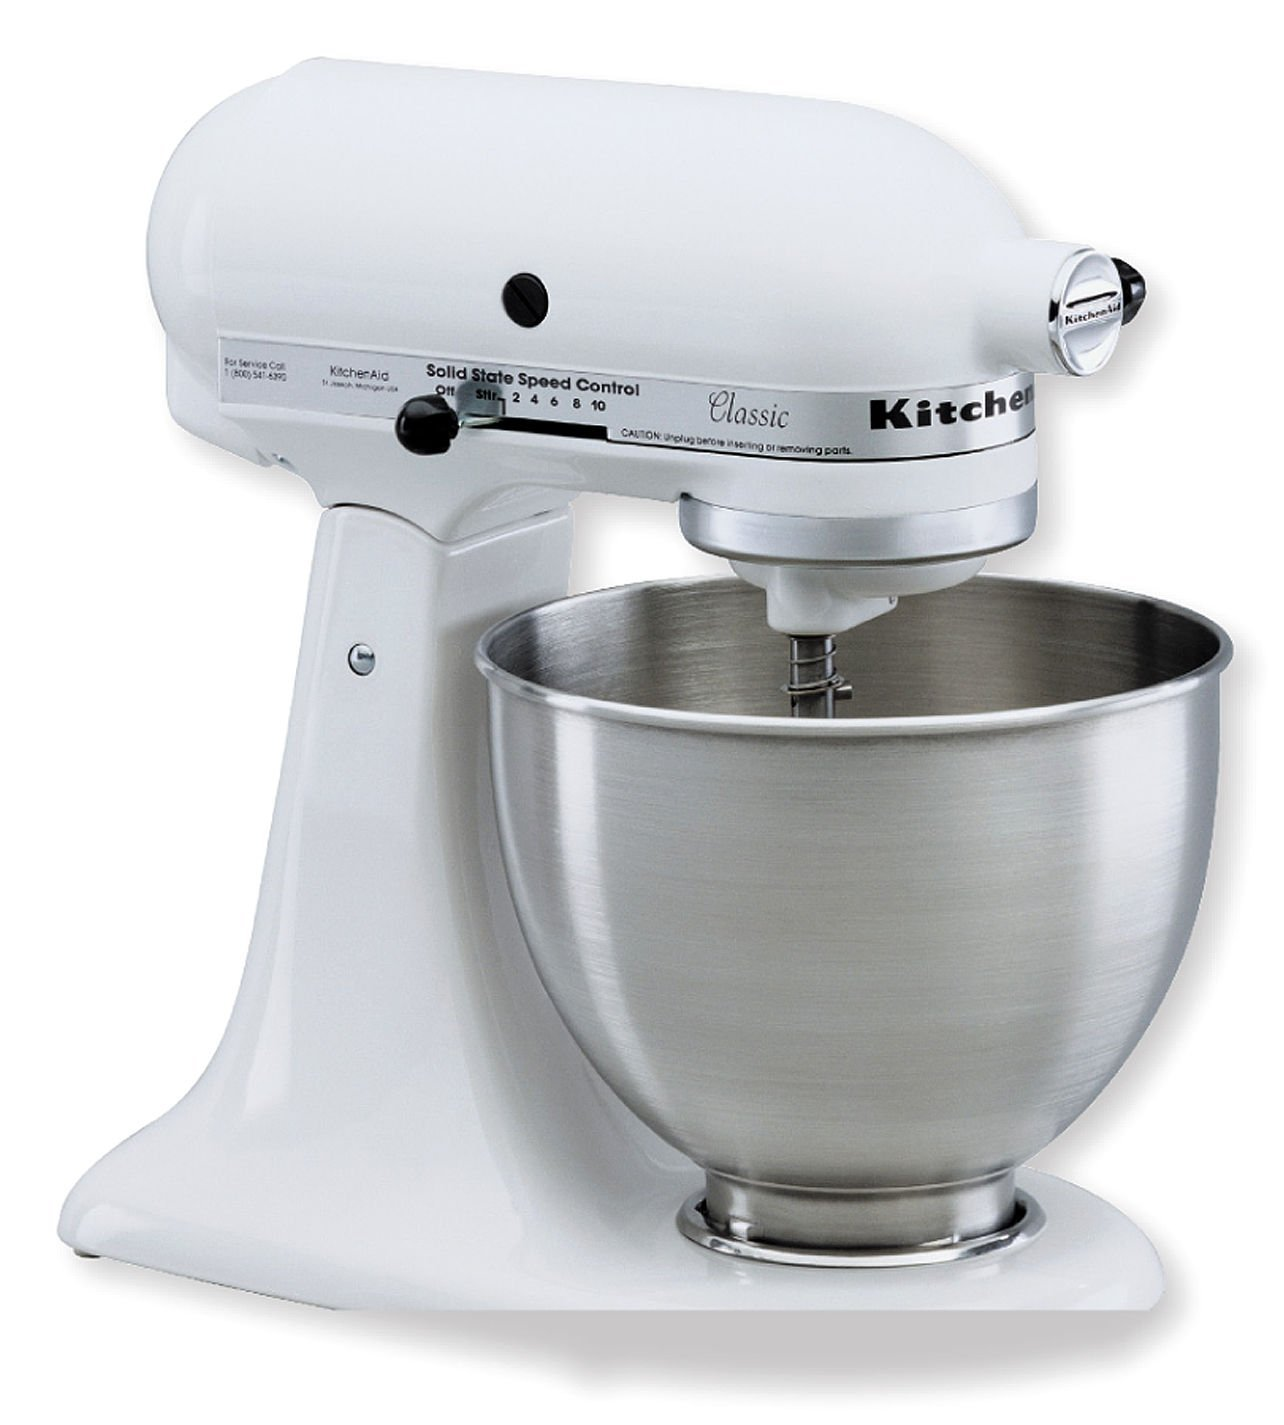 Kitchenaid classic plus mixer photo - 1